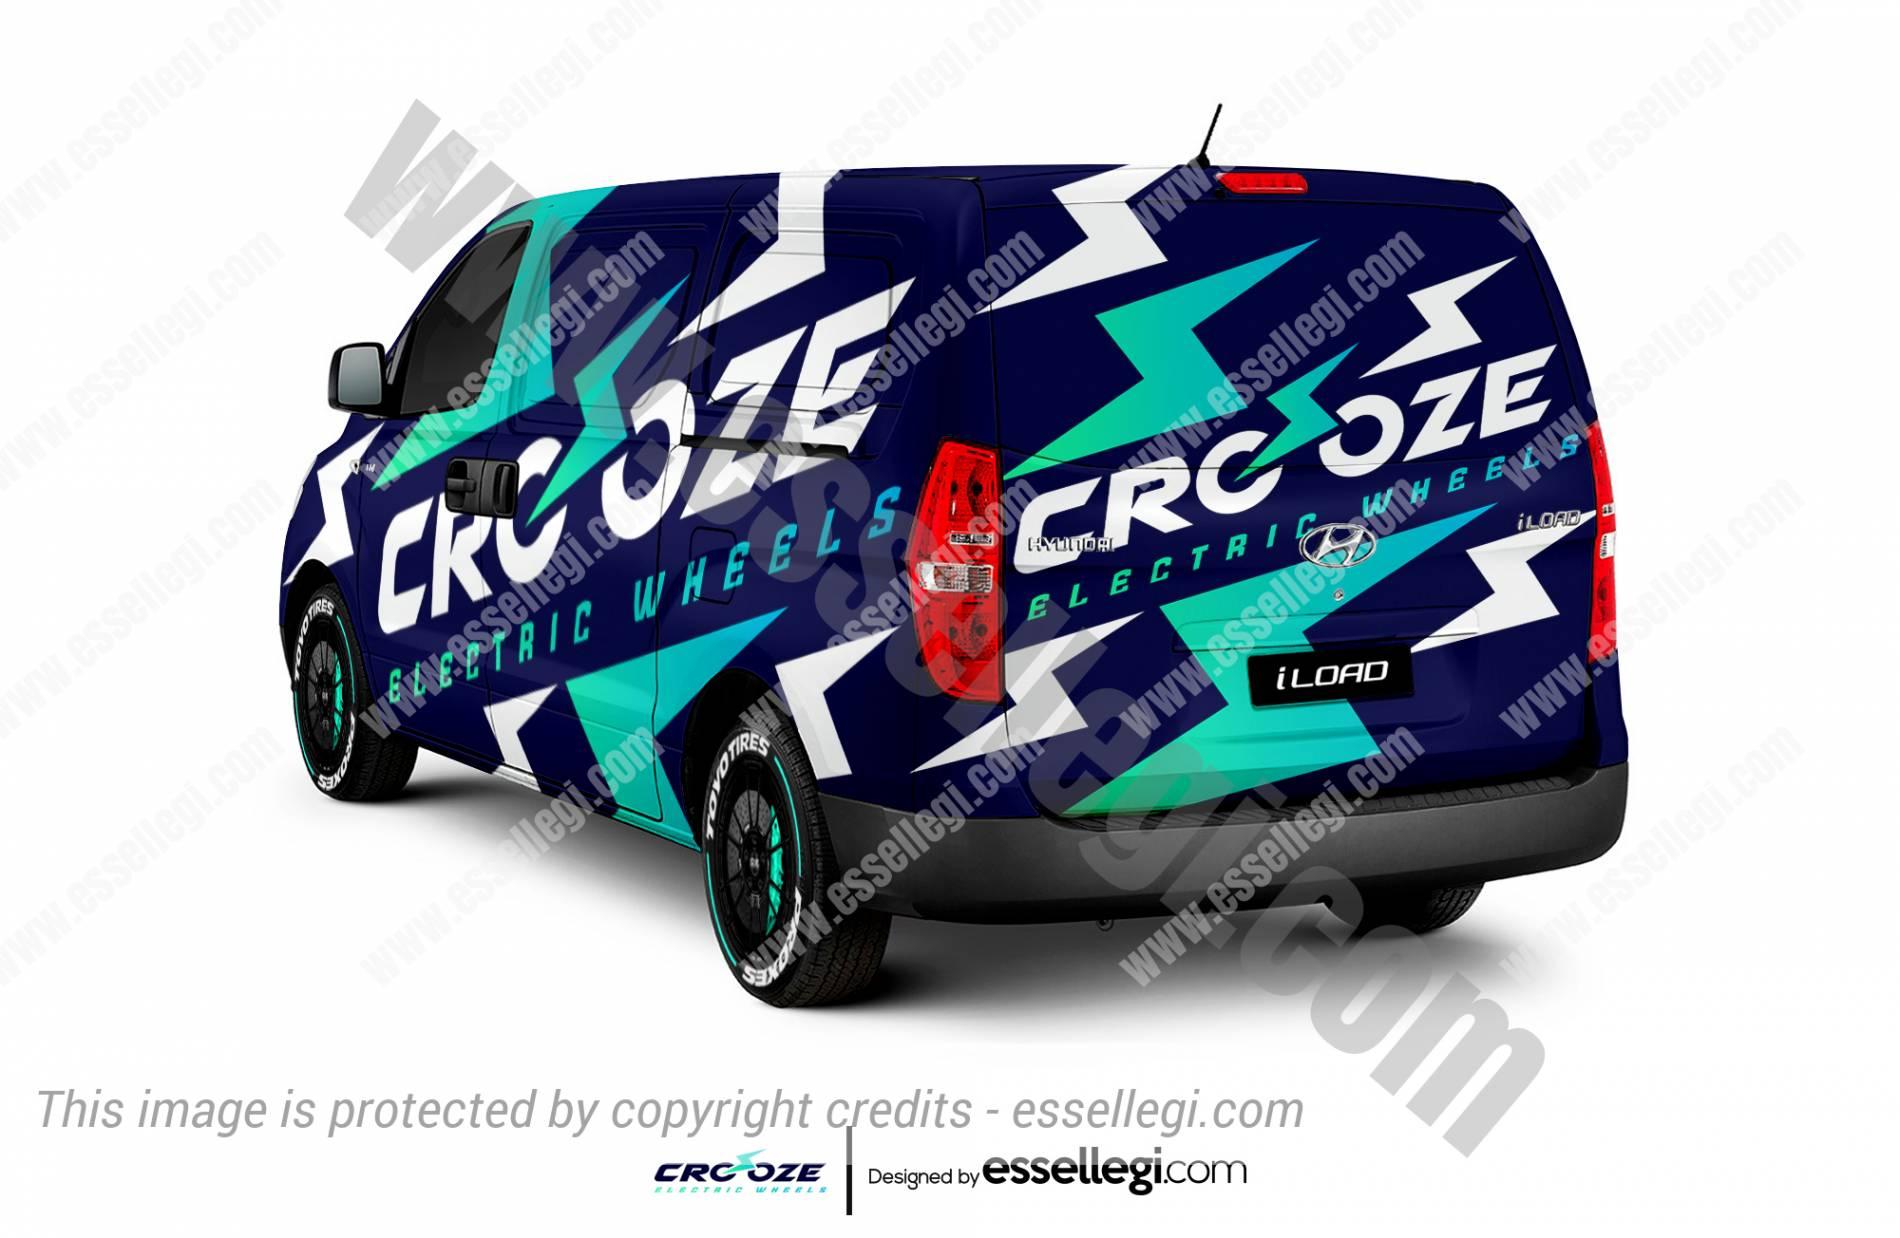 Hyundai iLoad Wrap Design. Hyundai iLoad | Van Wrap Design by Essellegi. Van Signs, Van Signage, Van Wrapping, Van Signwriting, Van Wrap Designer, Signs for Van, Van Logo, Van Graphic by Essellegi.